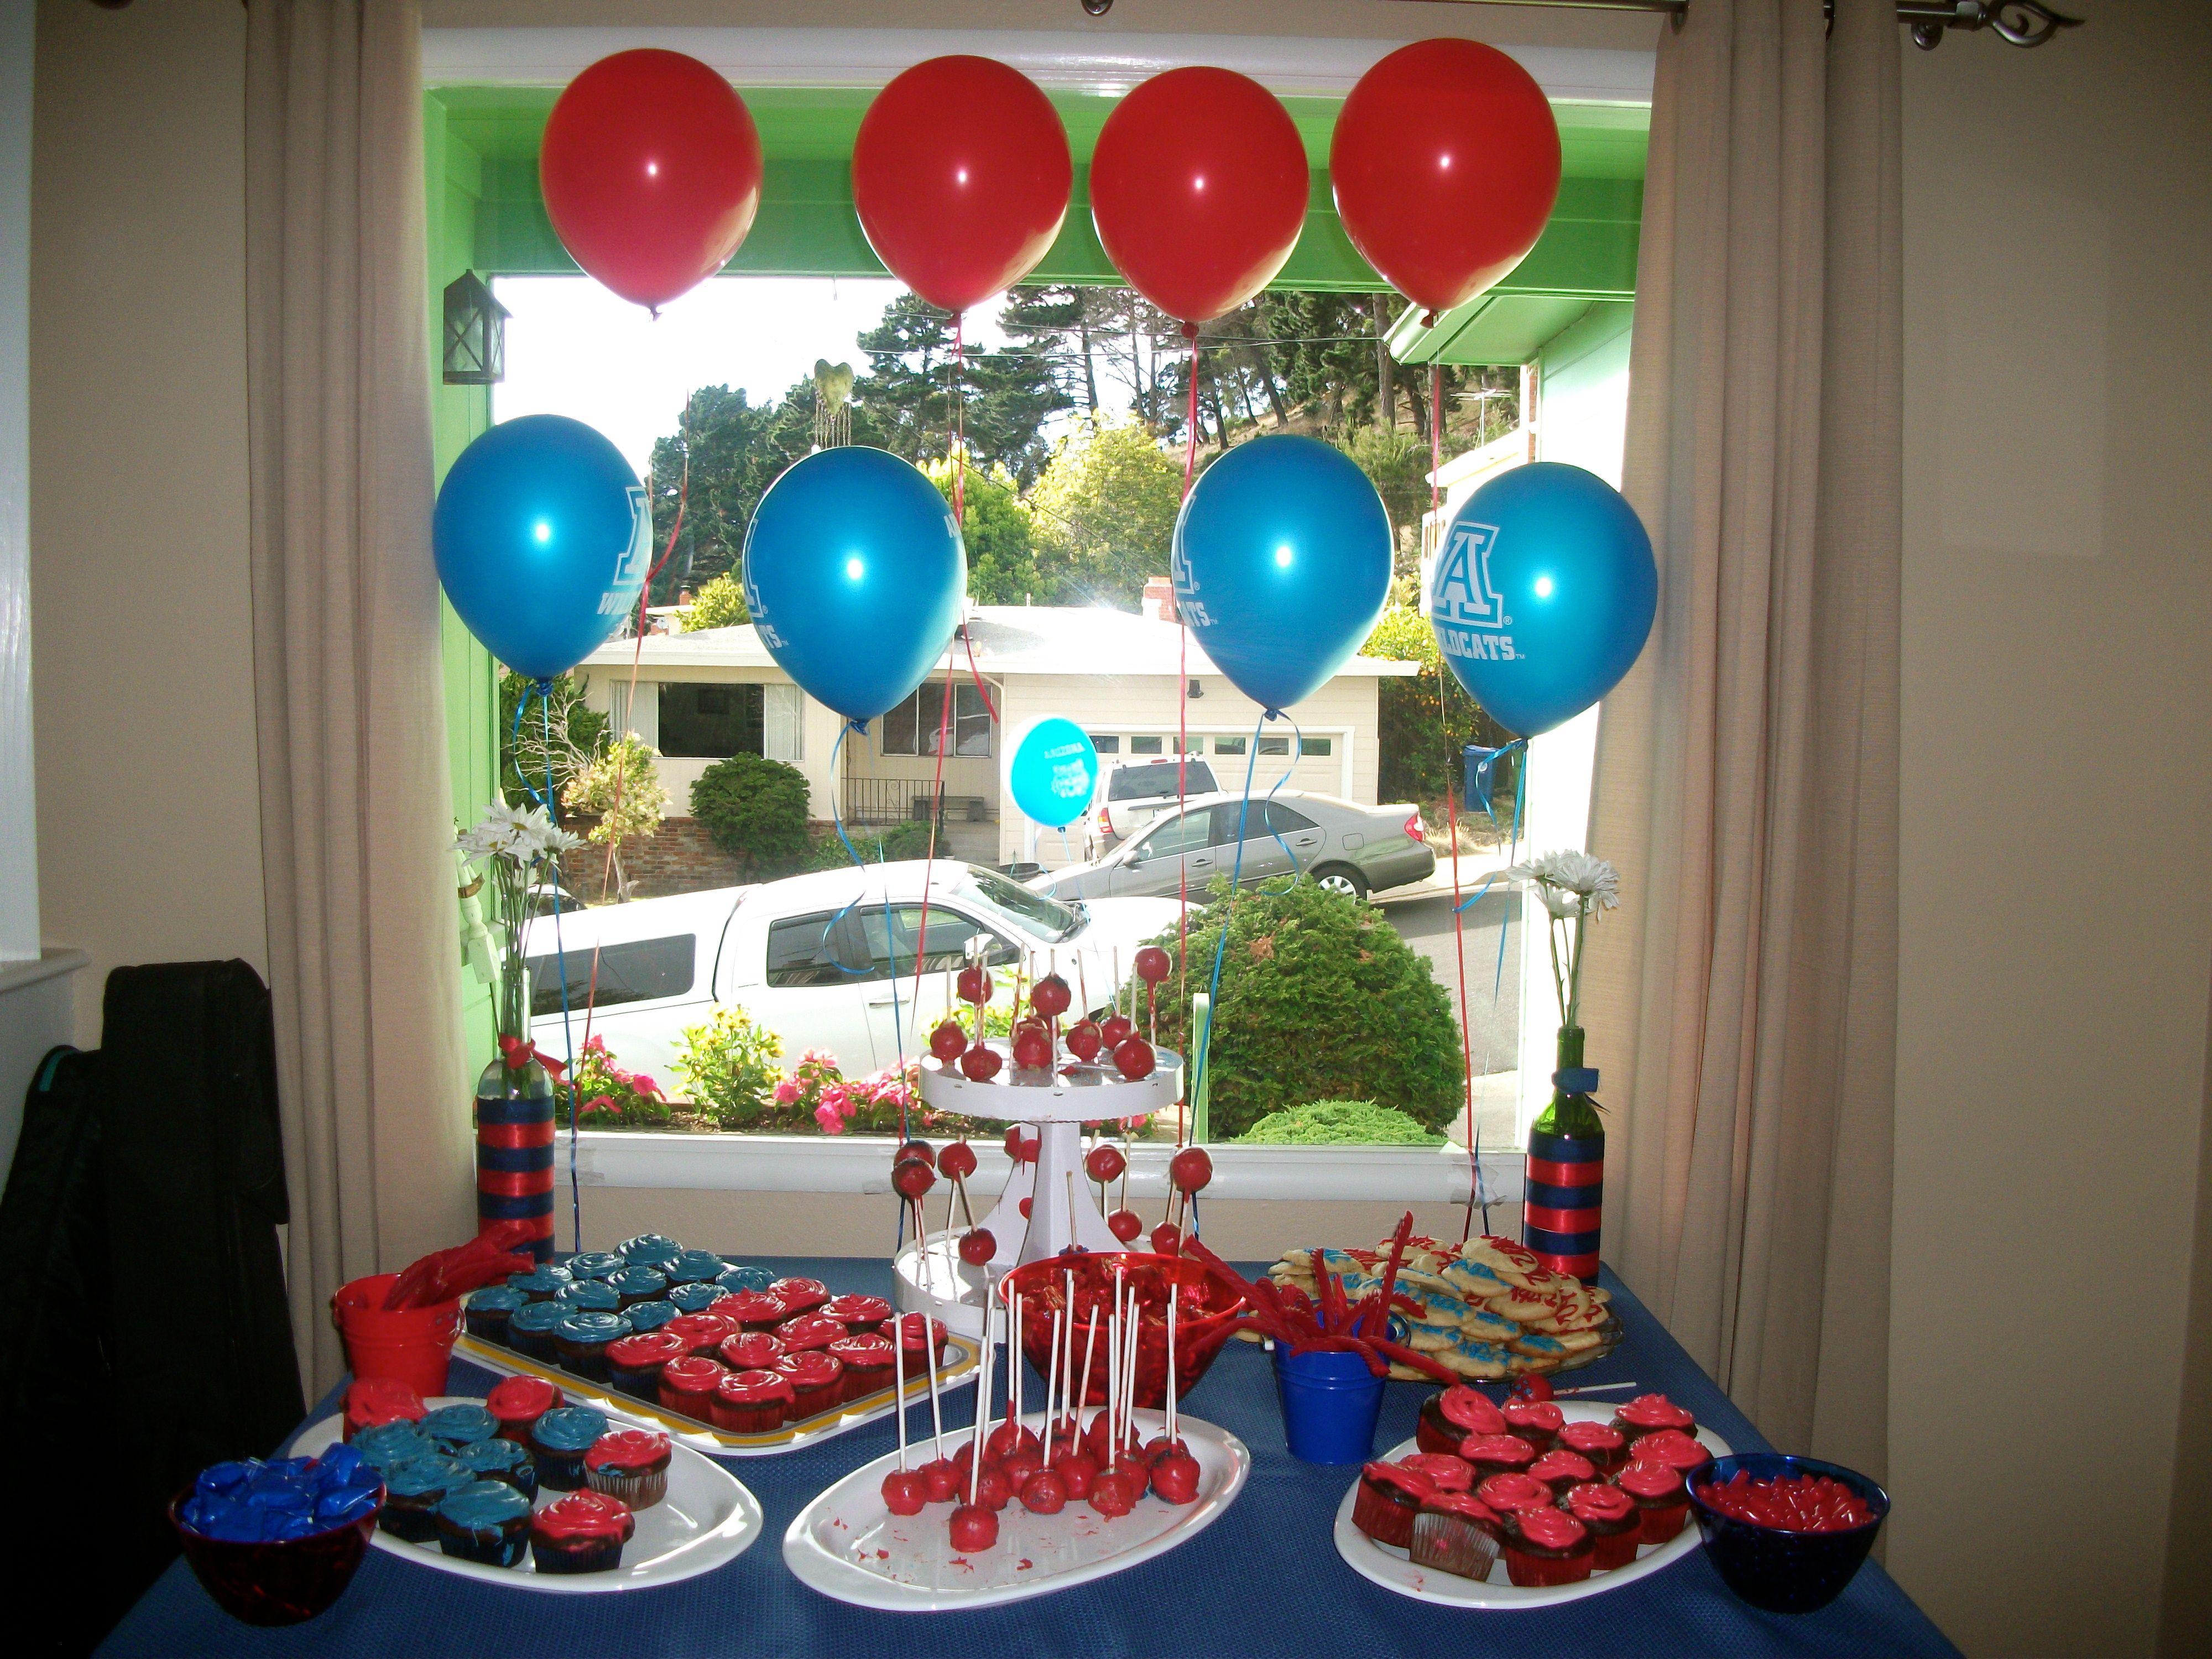 University of Arizona graduation party dessert table